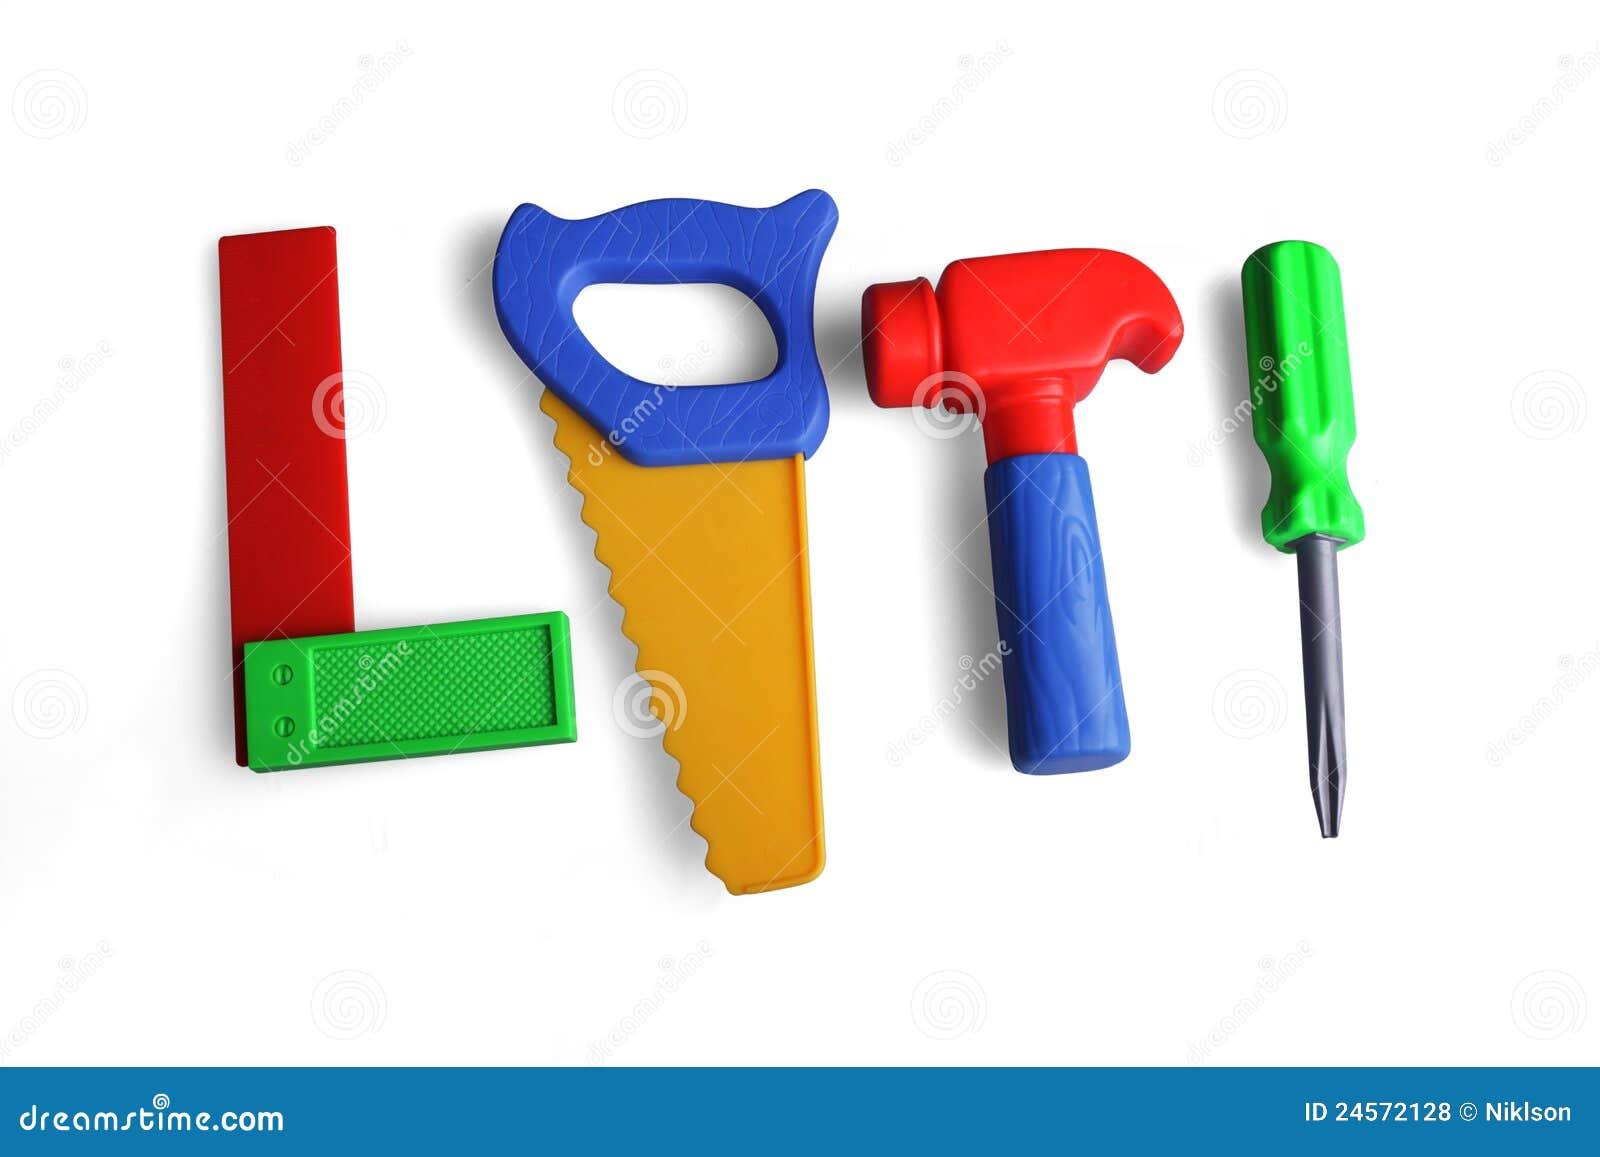 Plastic Toy Tools : Tools hammer saw screwdriver angle plastic stock